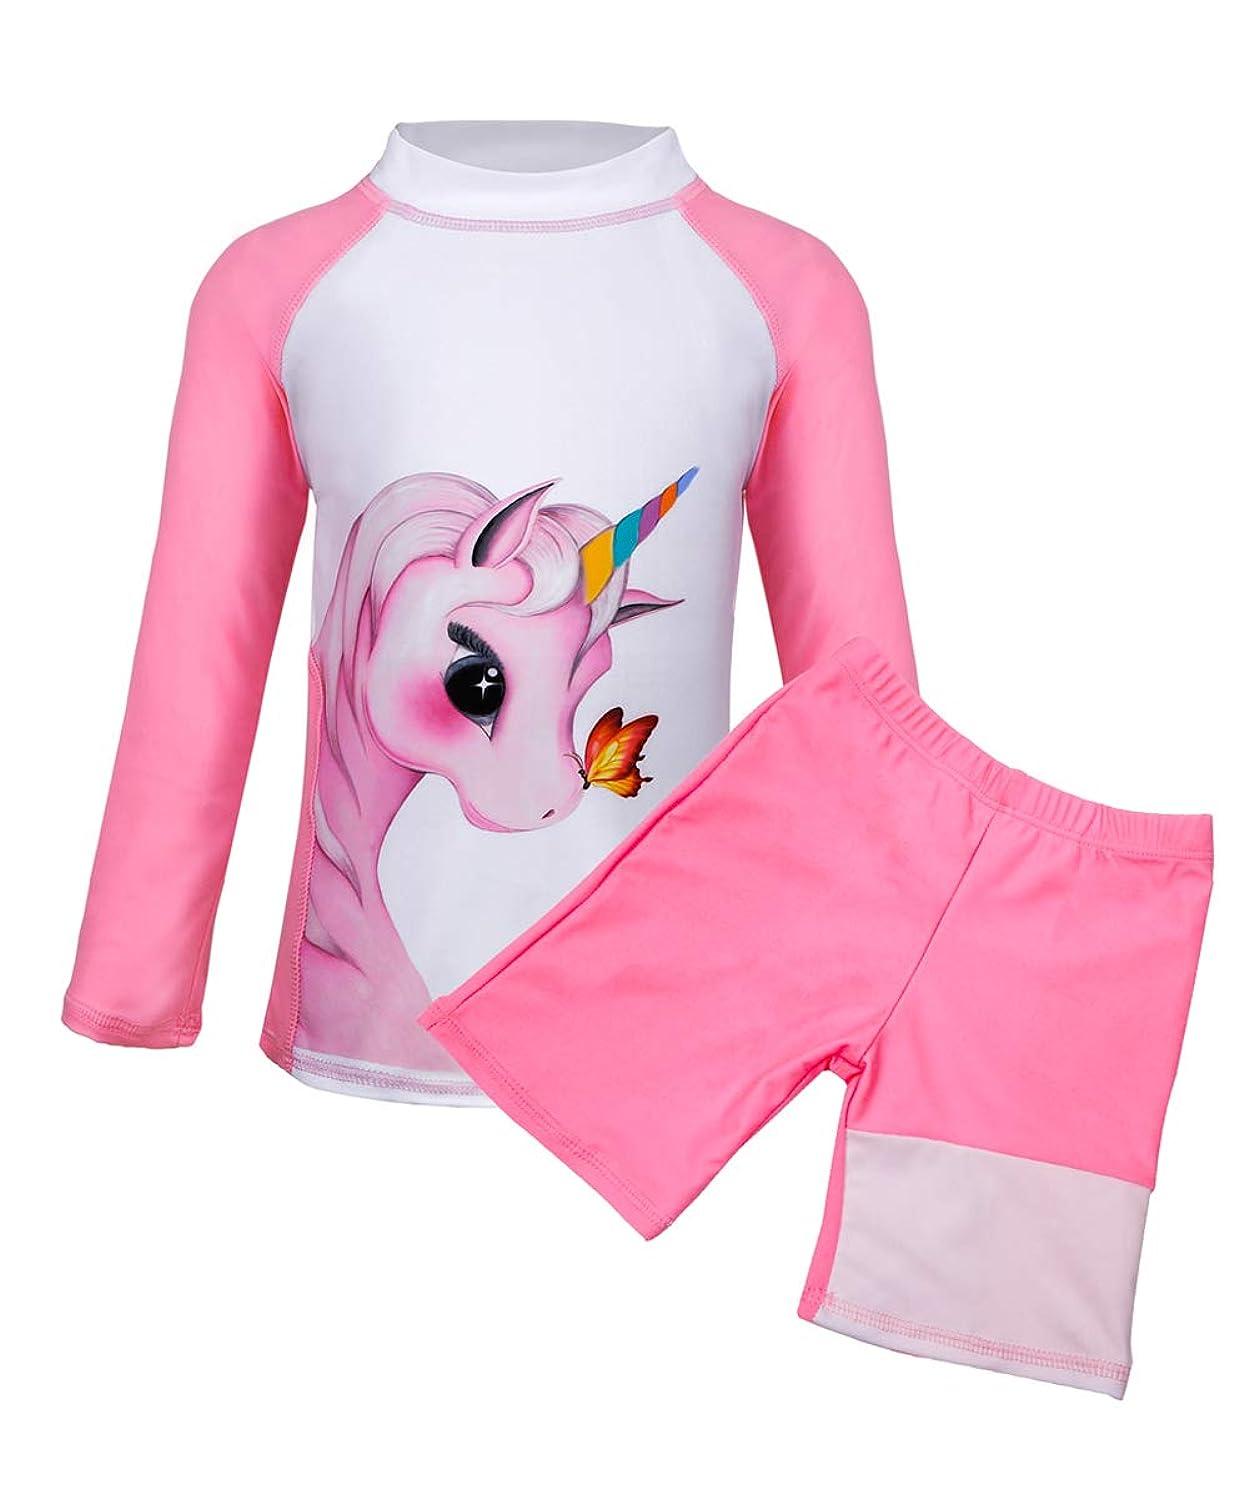 Suyye Girls Two Pieces Swimsuits Unicorn Rash Guard Tankini Kids Swimwear